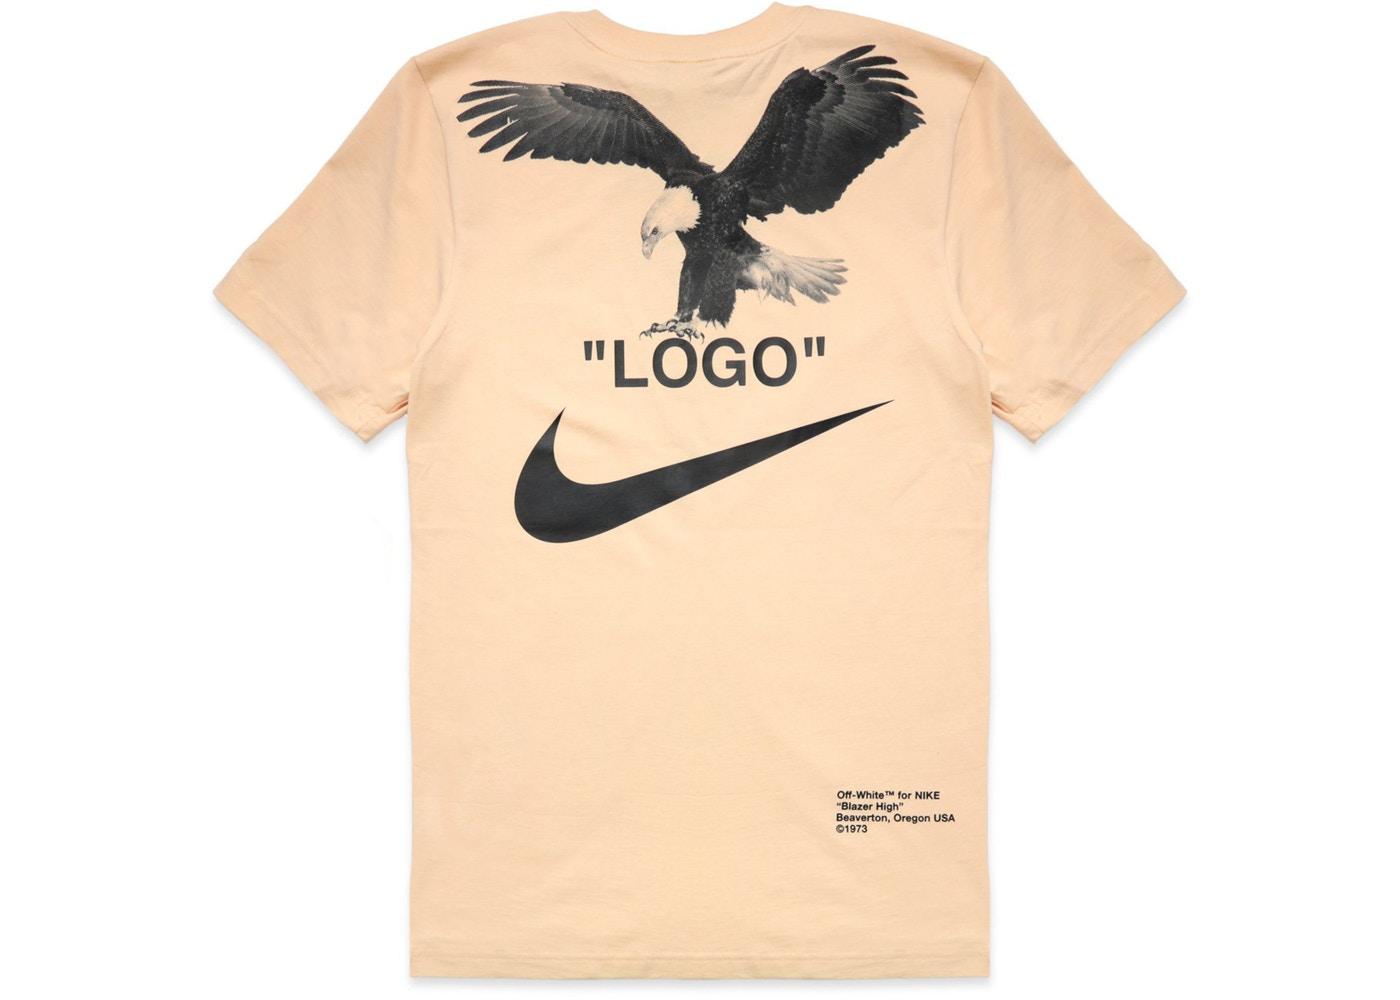 raya pecho Padre  Nike Off-white X Nike Nrg A6 Tee - Vanilla | Grailed